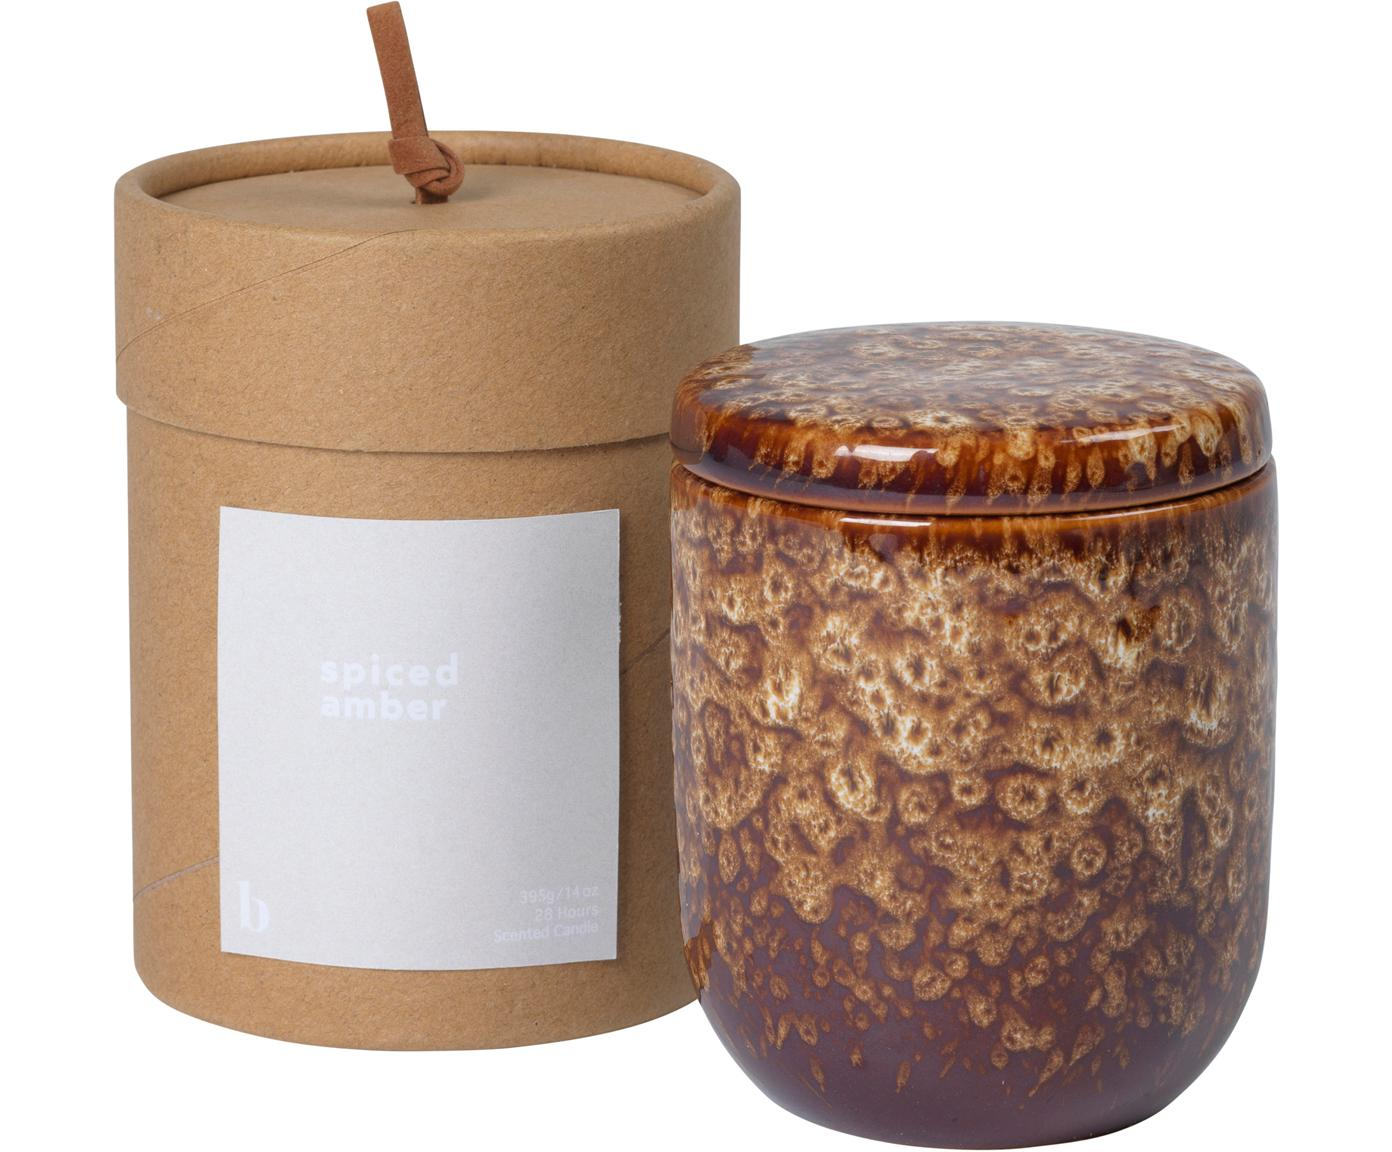 Duftkerze Spiced Amber, Behälter: Keramik, Brauntöne, Ø 8 x H 9 cm